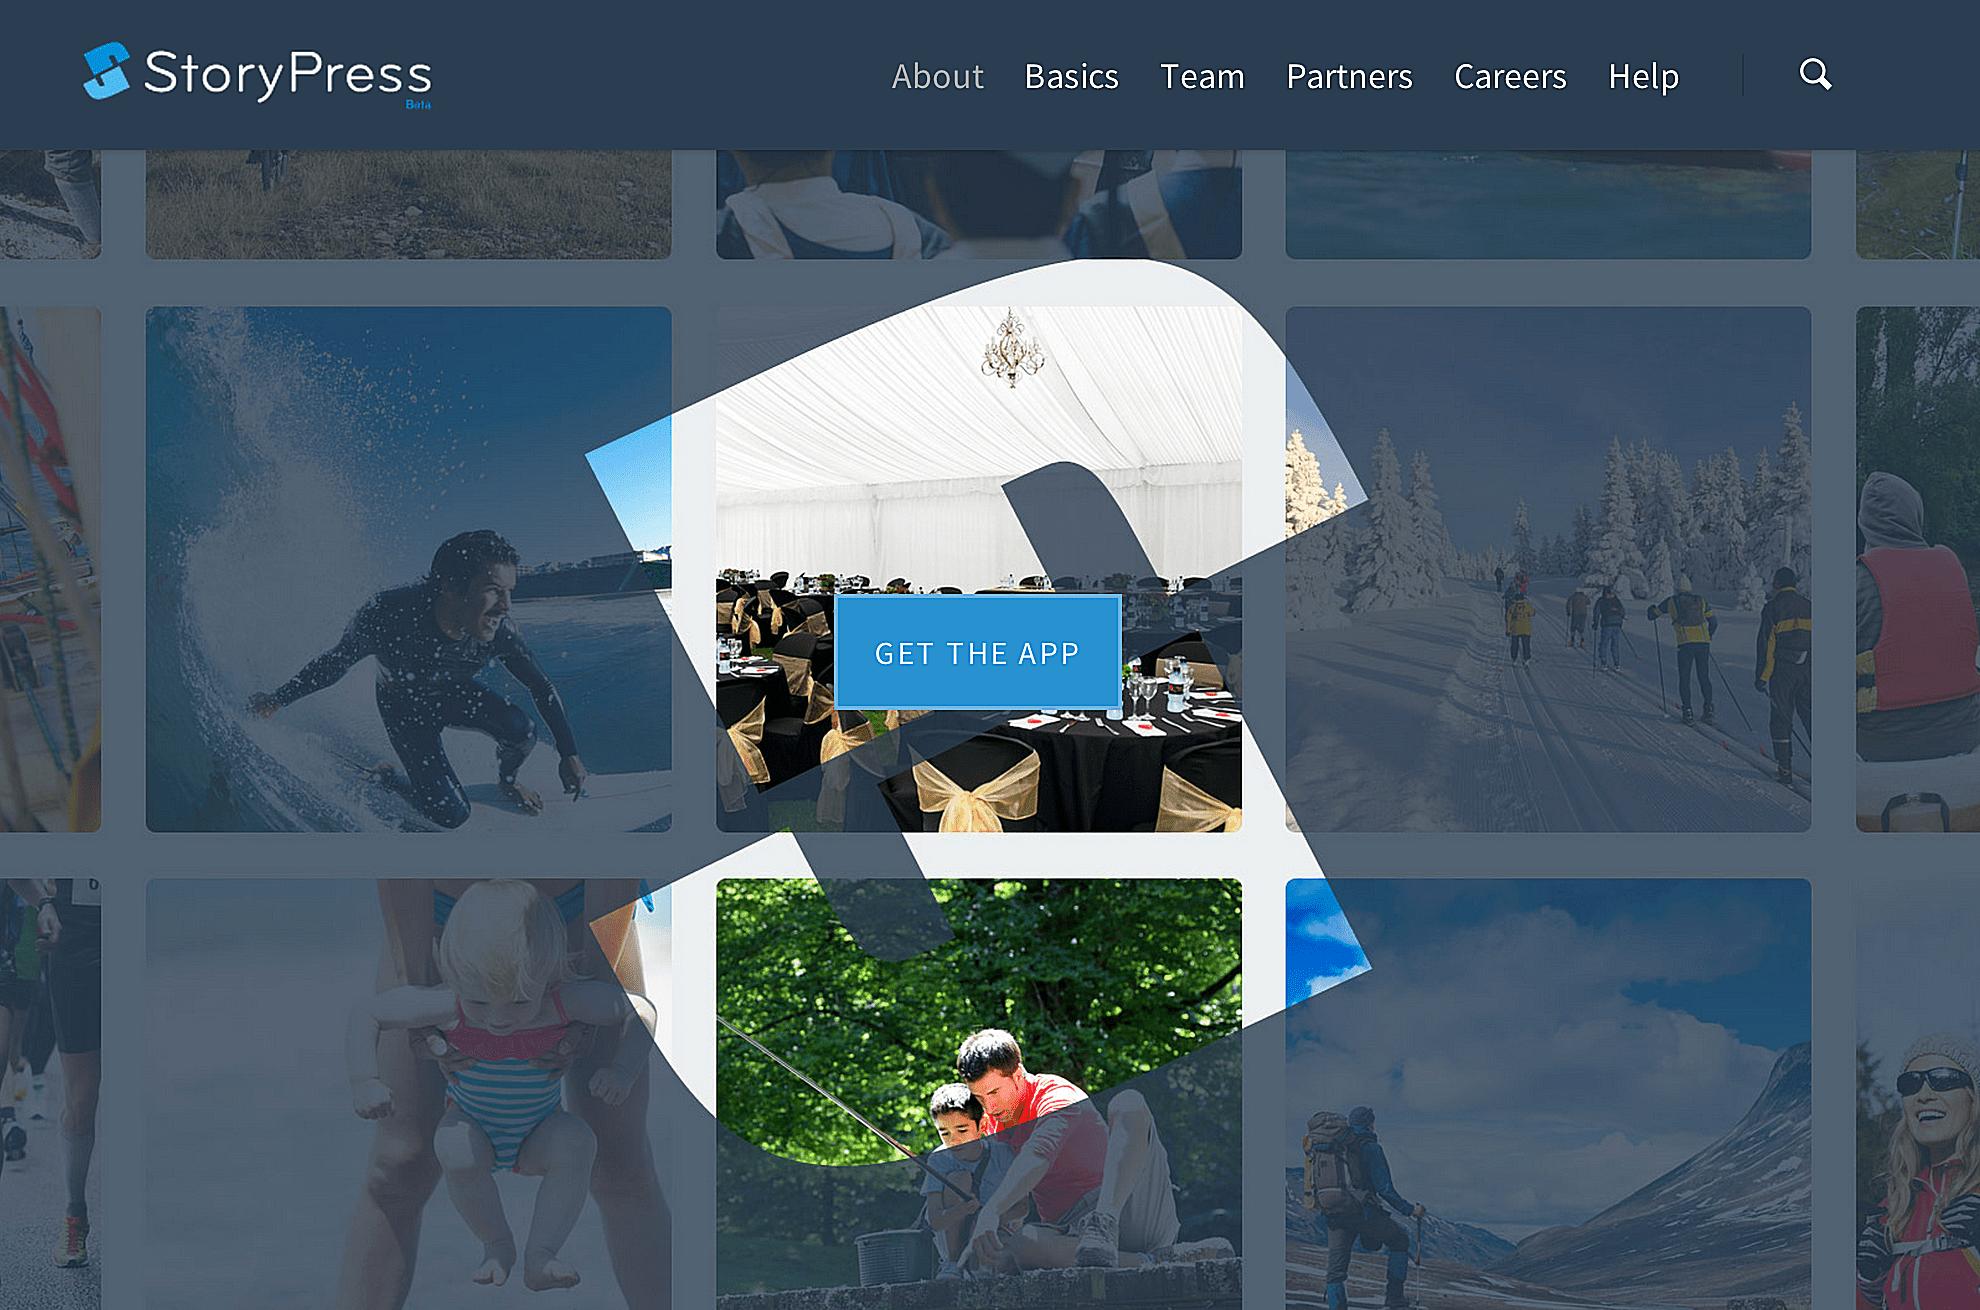 StoryPress